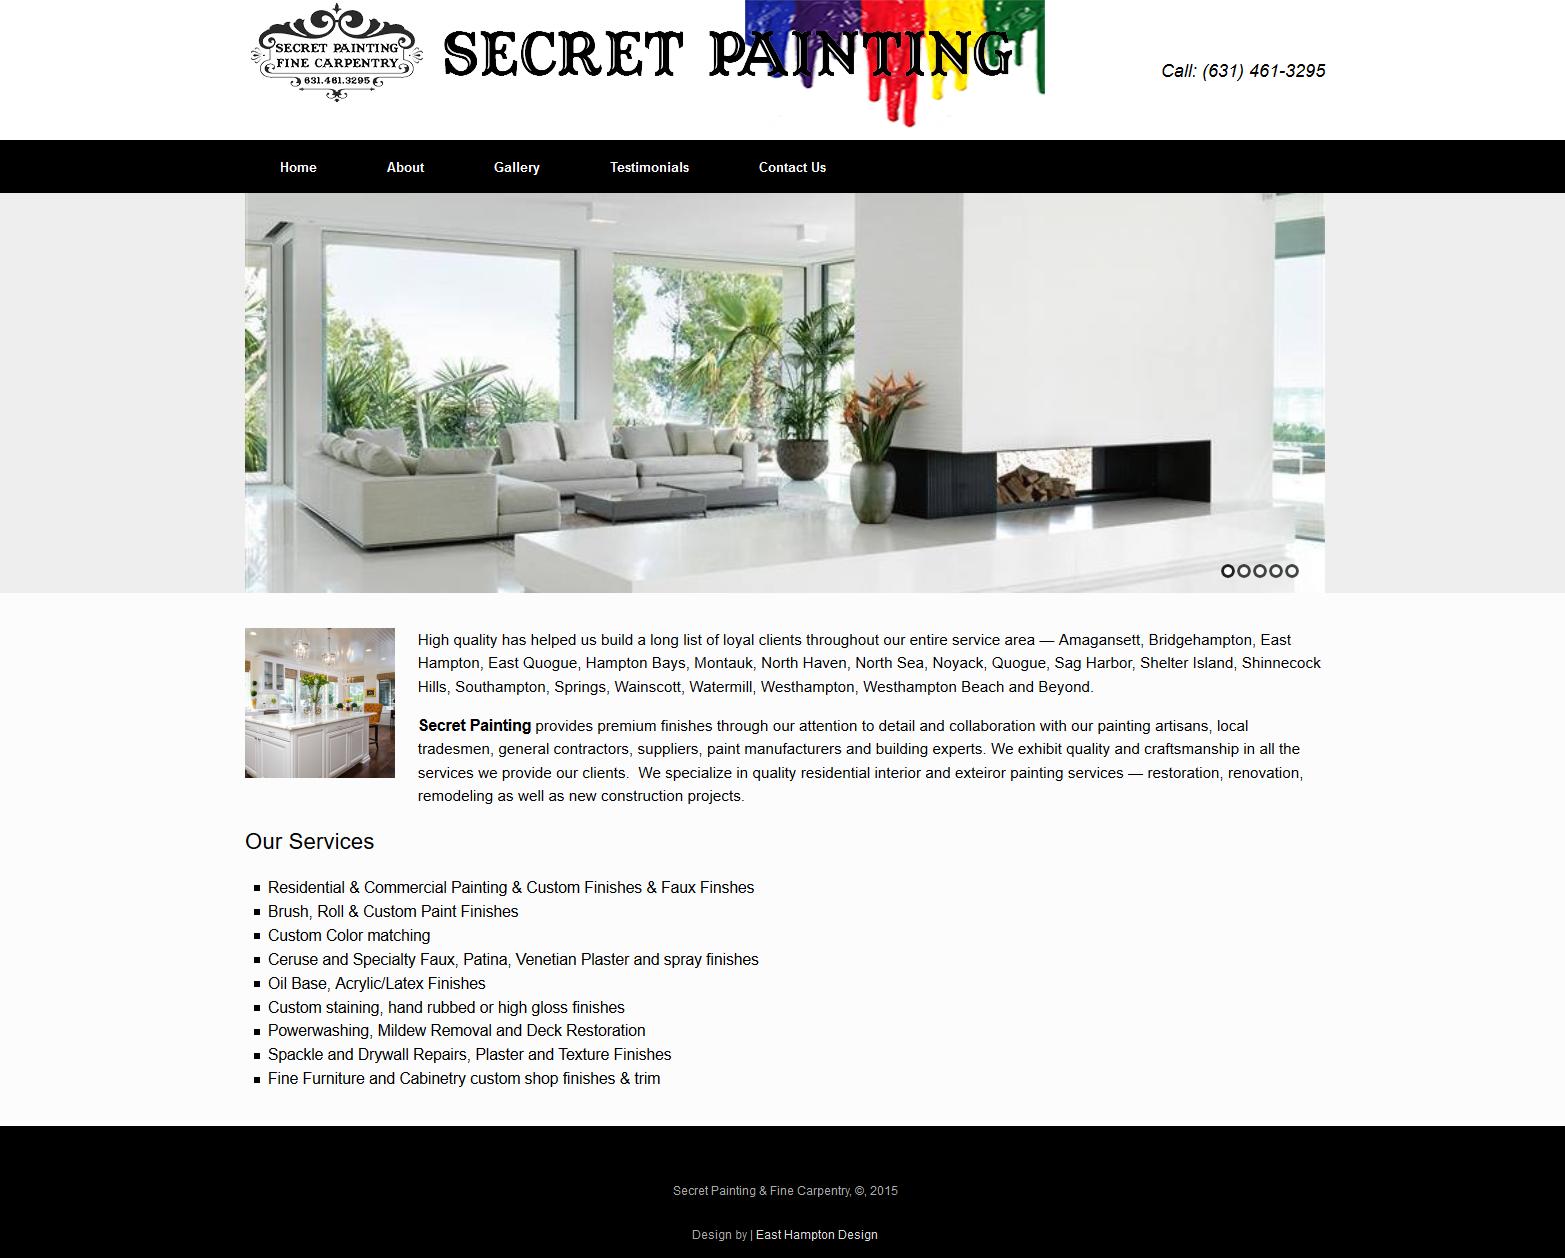 secretpainting